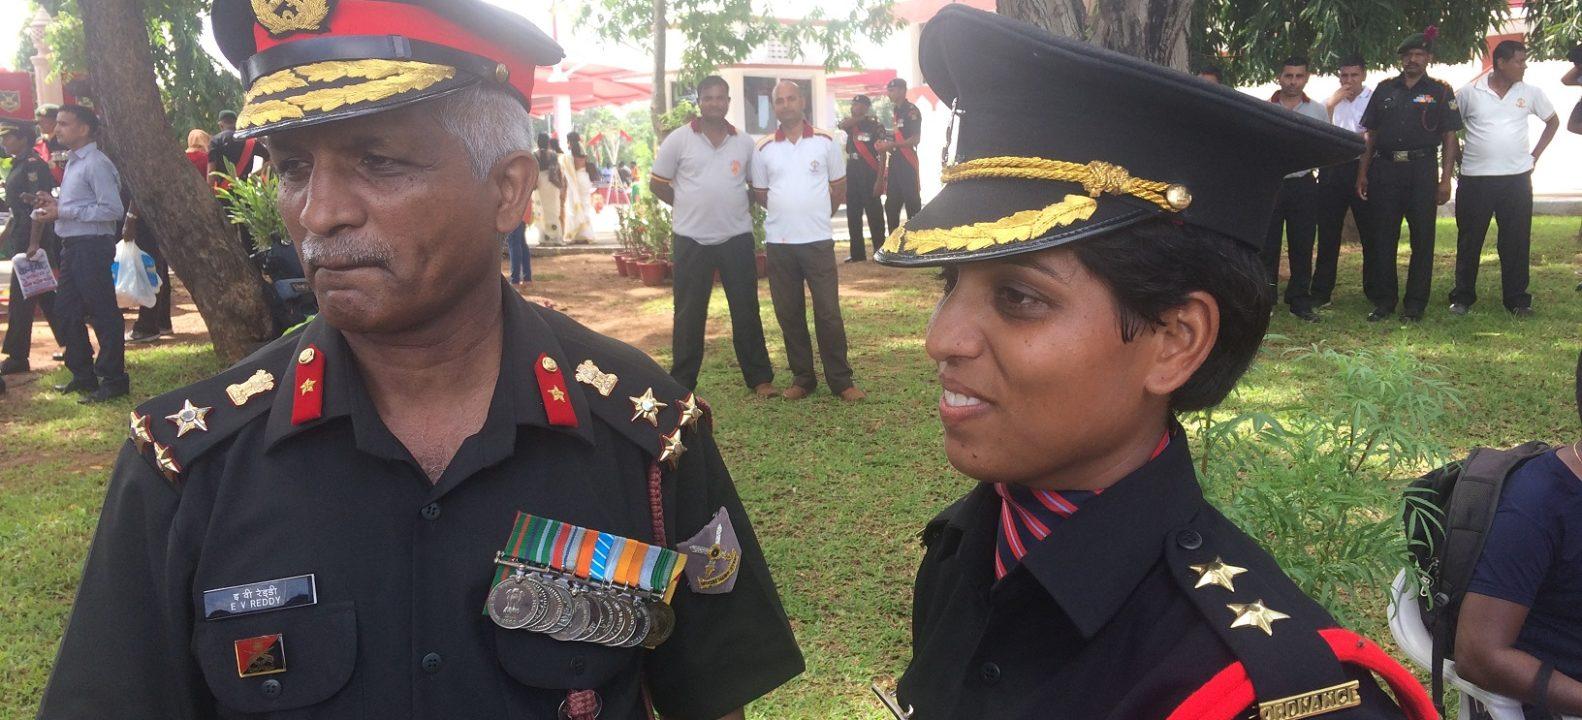 Nidhi Mishra with E V Reddy, centre commandant of Mahar Regiment